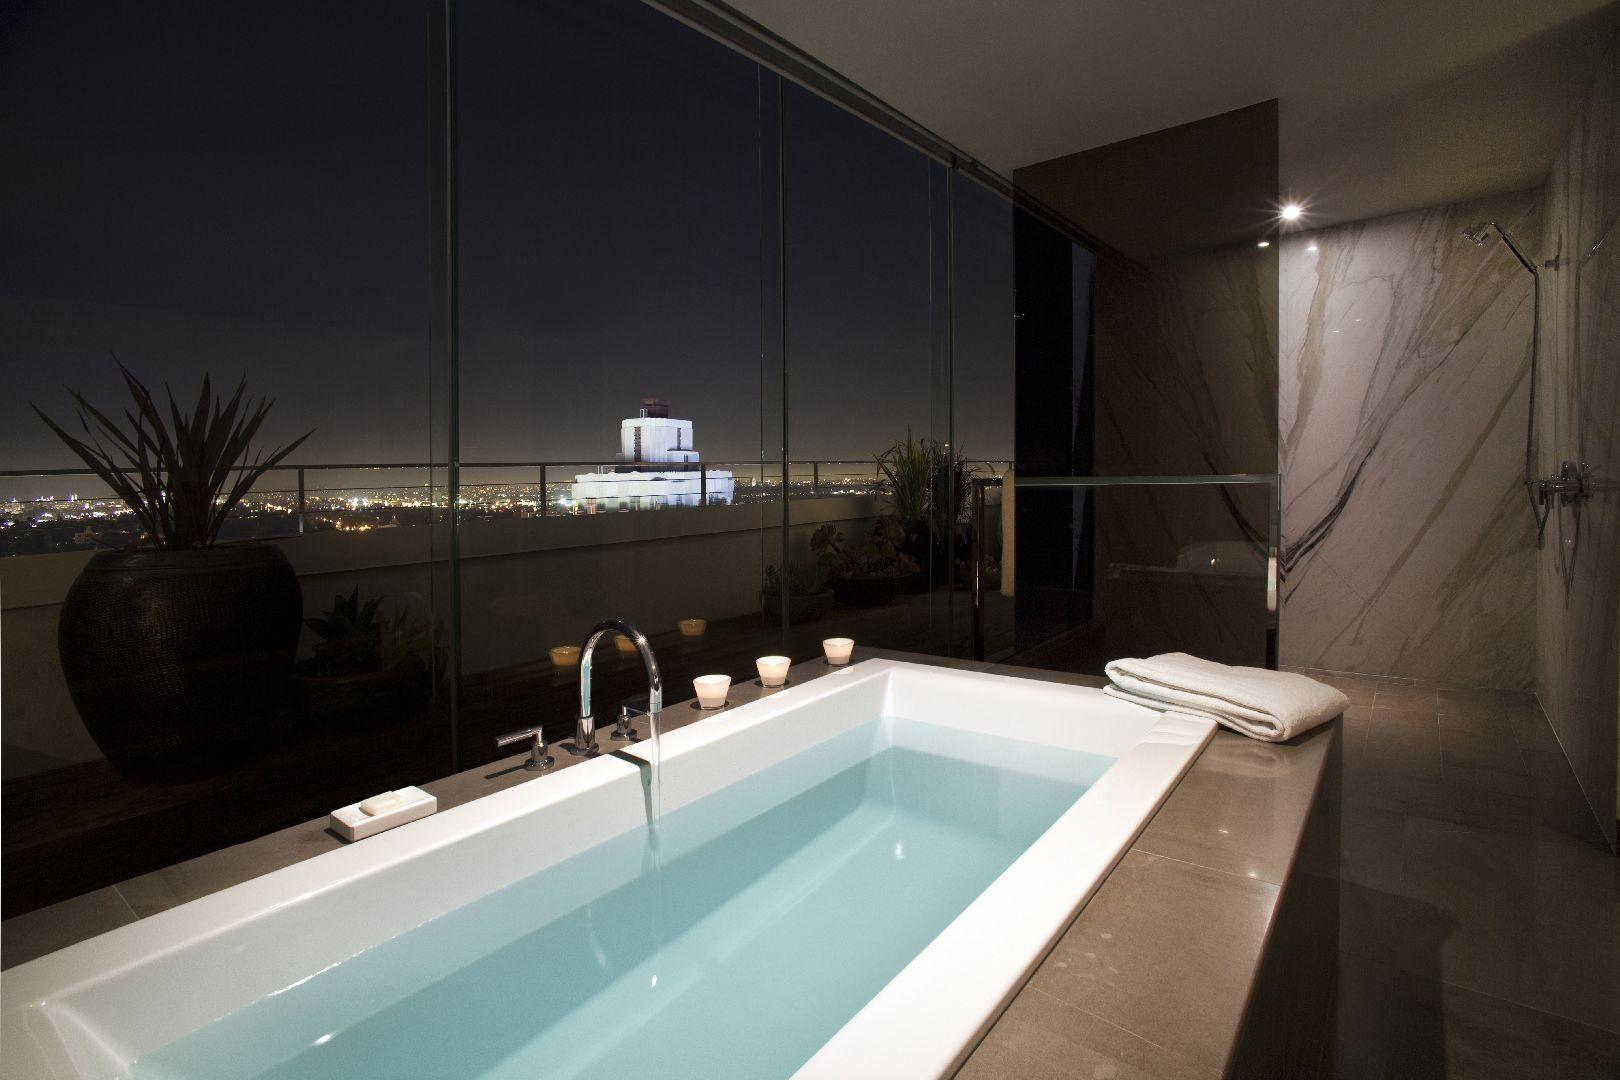 Hotel Andaz West Hollywood Los Angeles Ca Five Star Alliance Luxury Hotel Bathroom Penthouse Living Bath Hotels